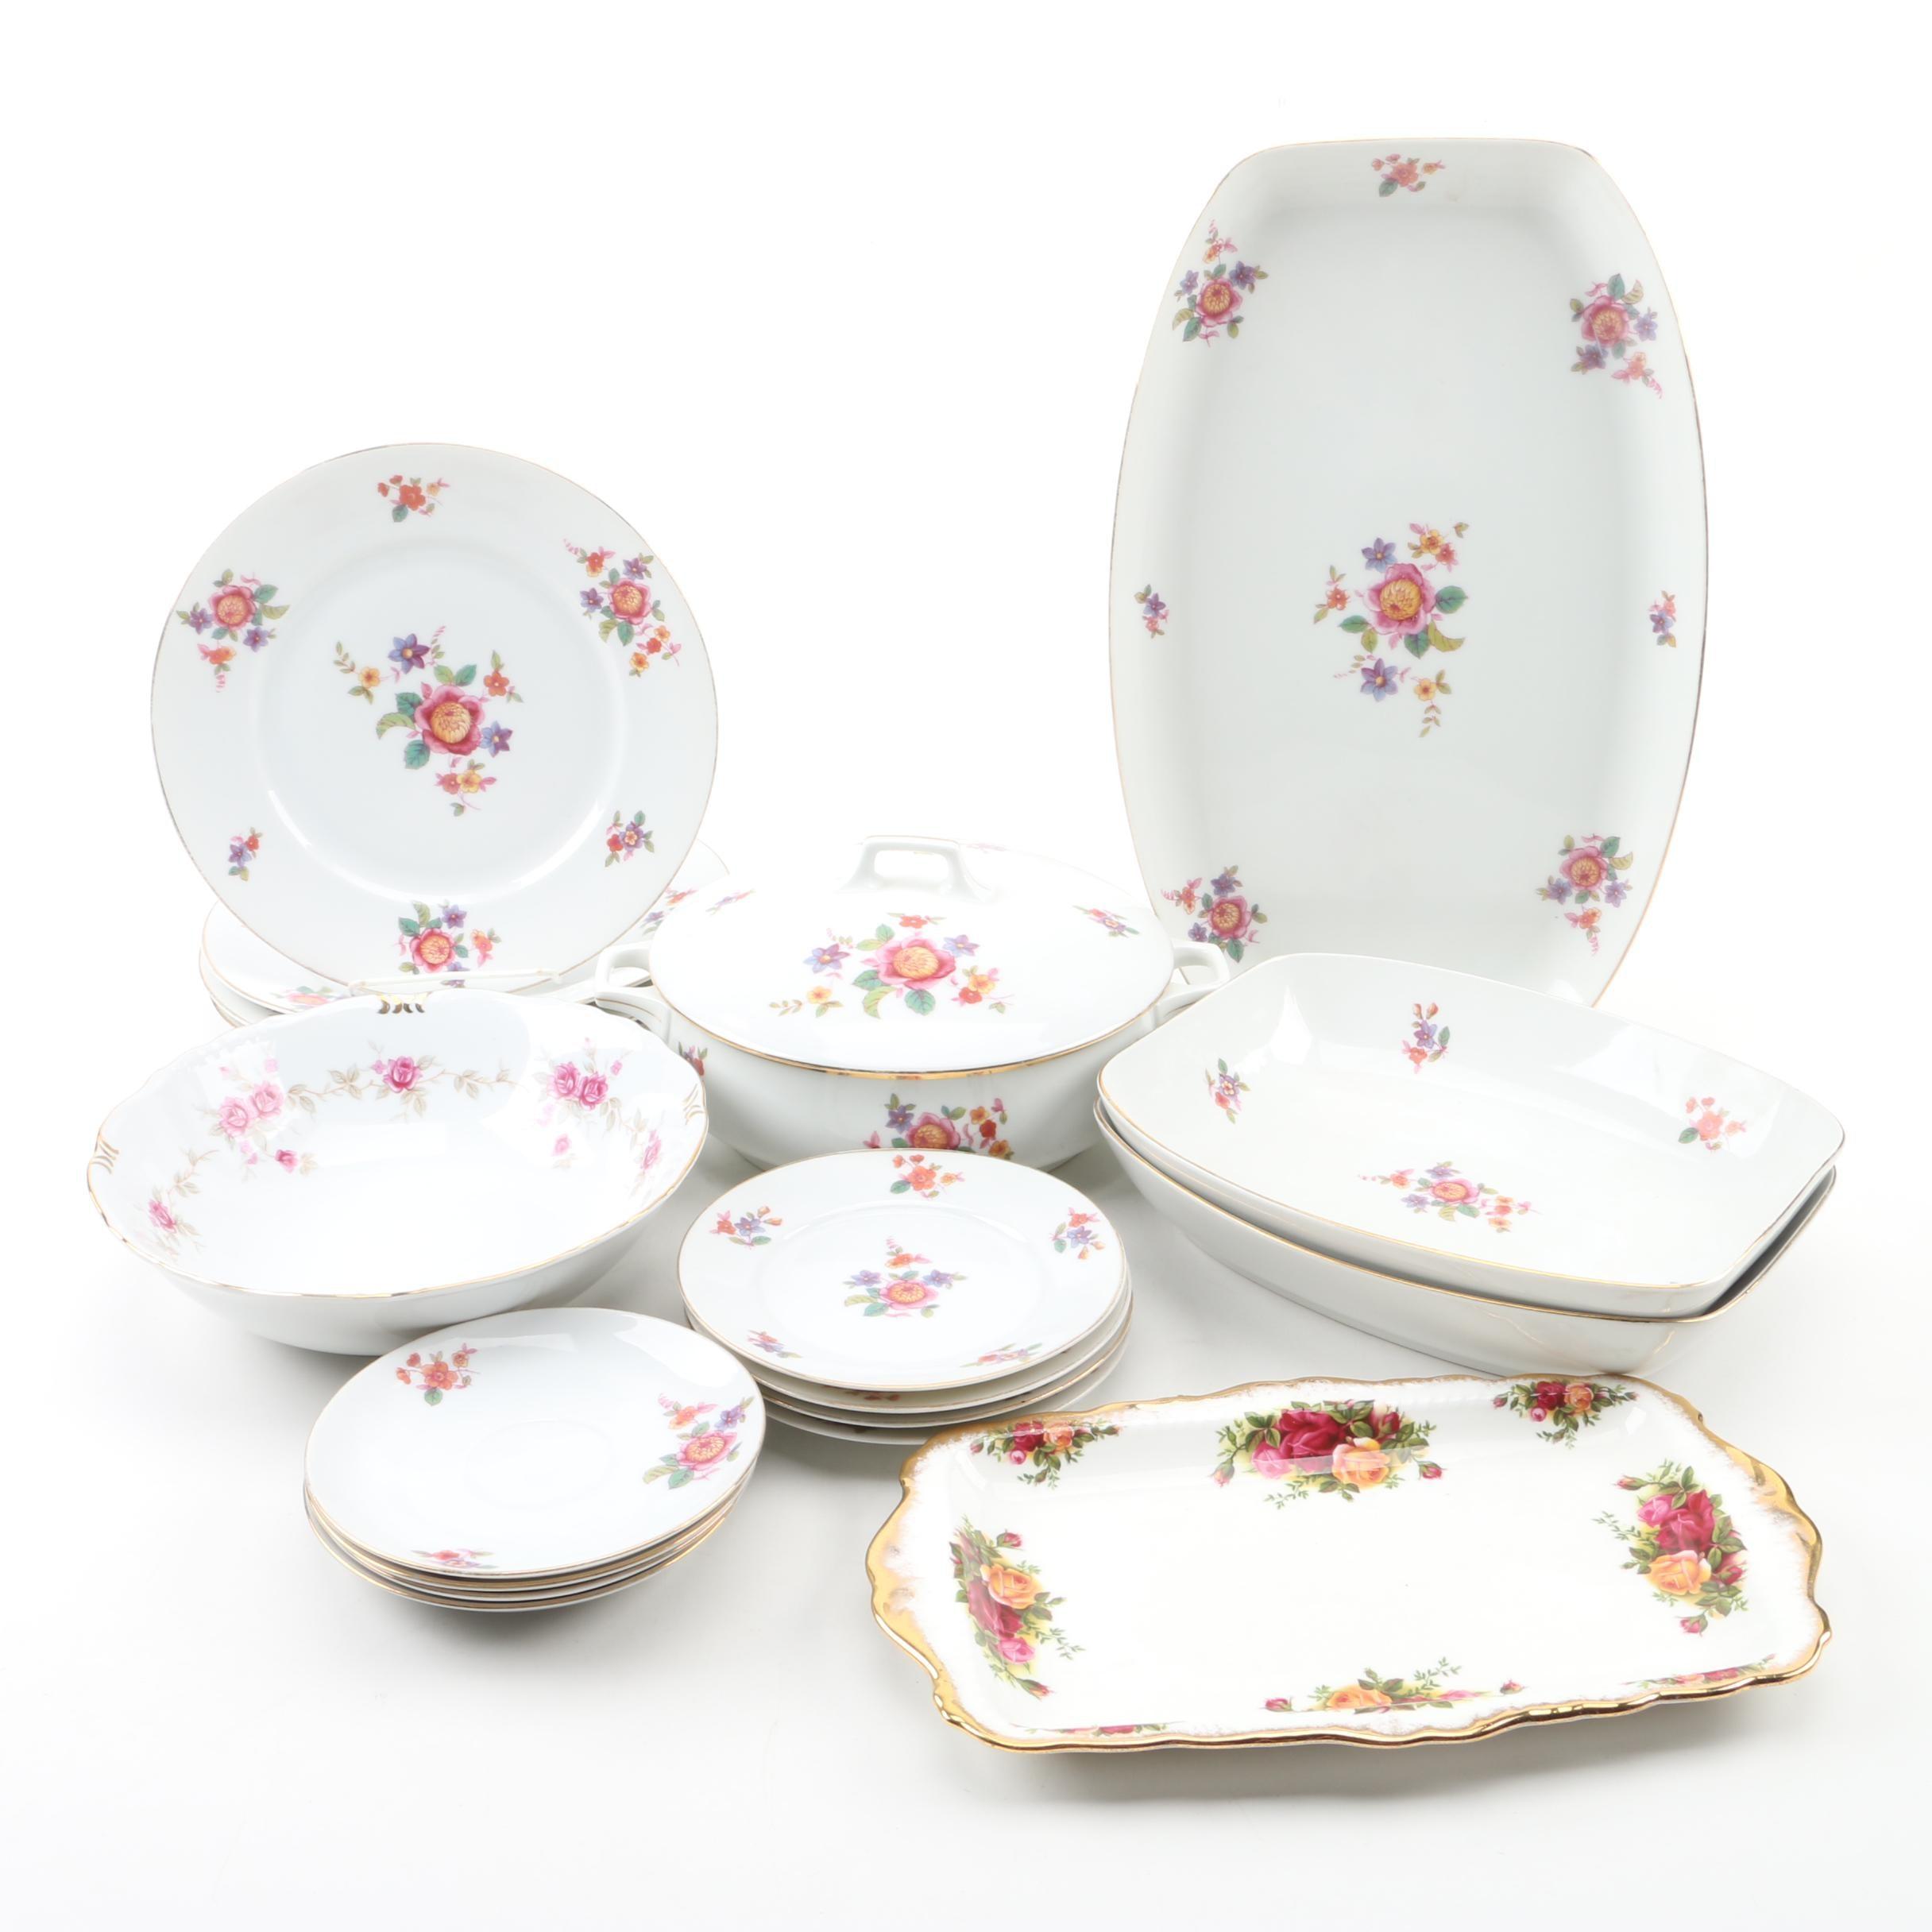 Porcelain Dinnerware Featuring Edelstein